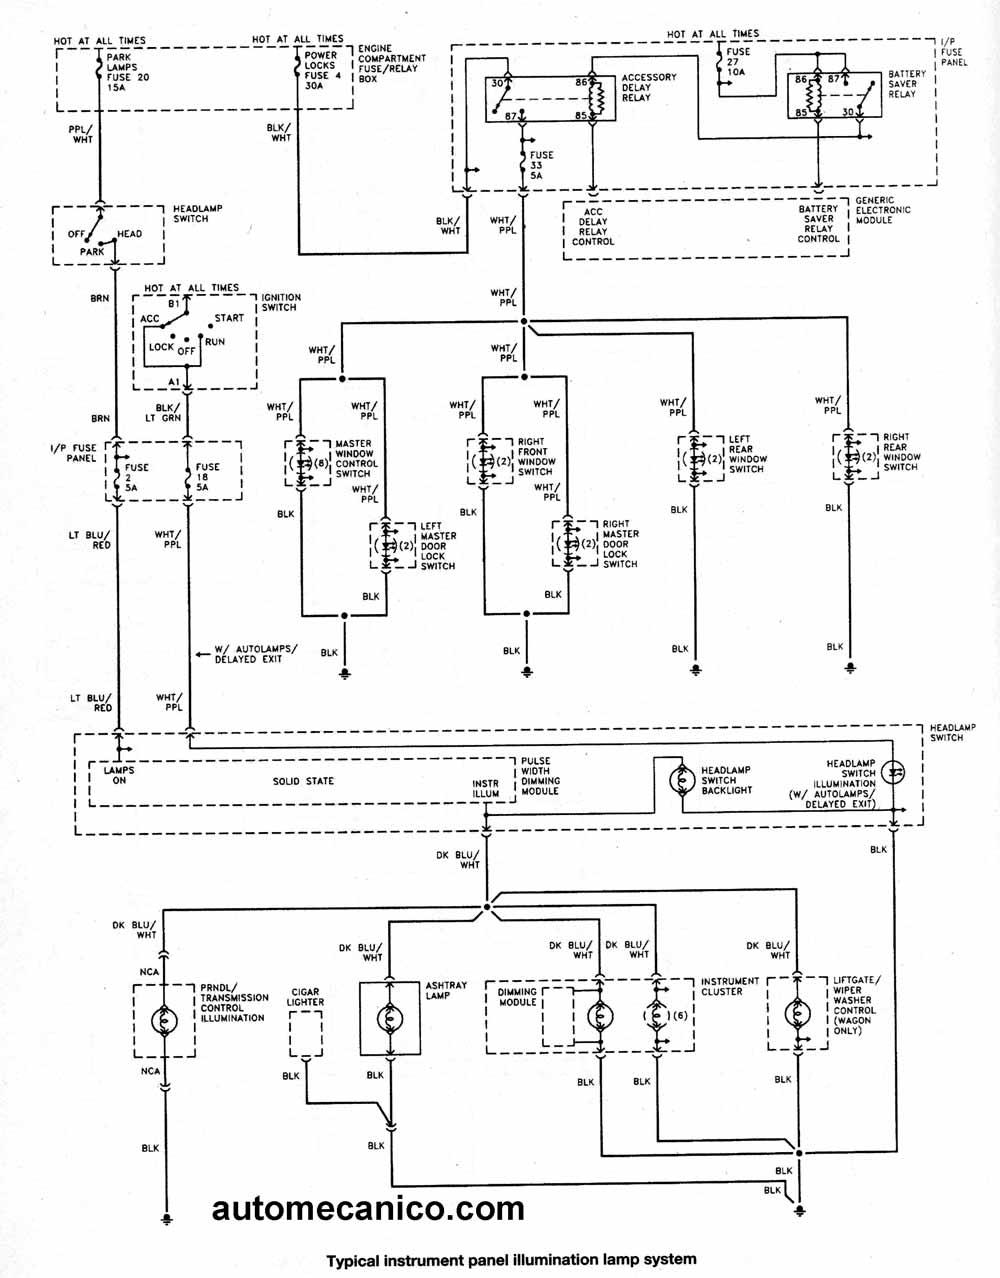 2000 ford windstar wiring diagram for heat pump | diagramas, esquemas electricos, taurus. mecanica automotriz